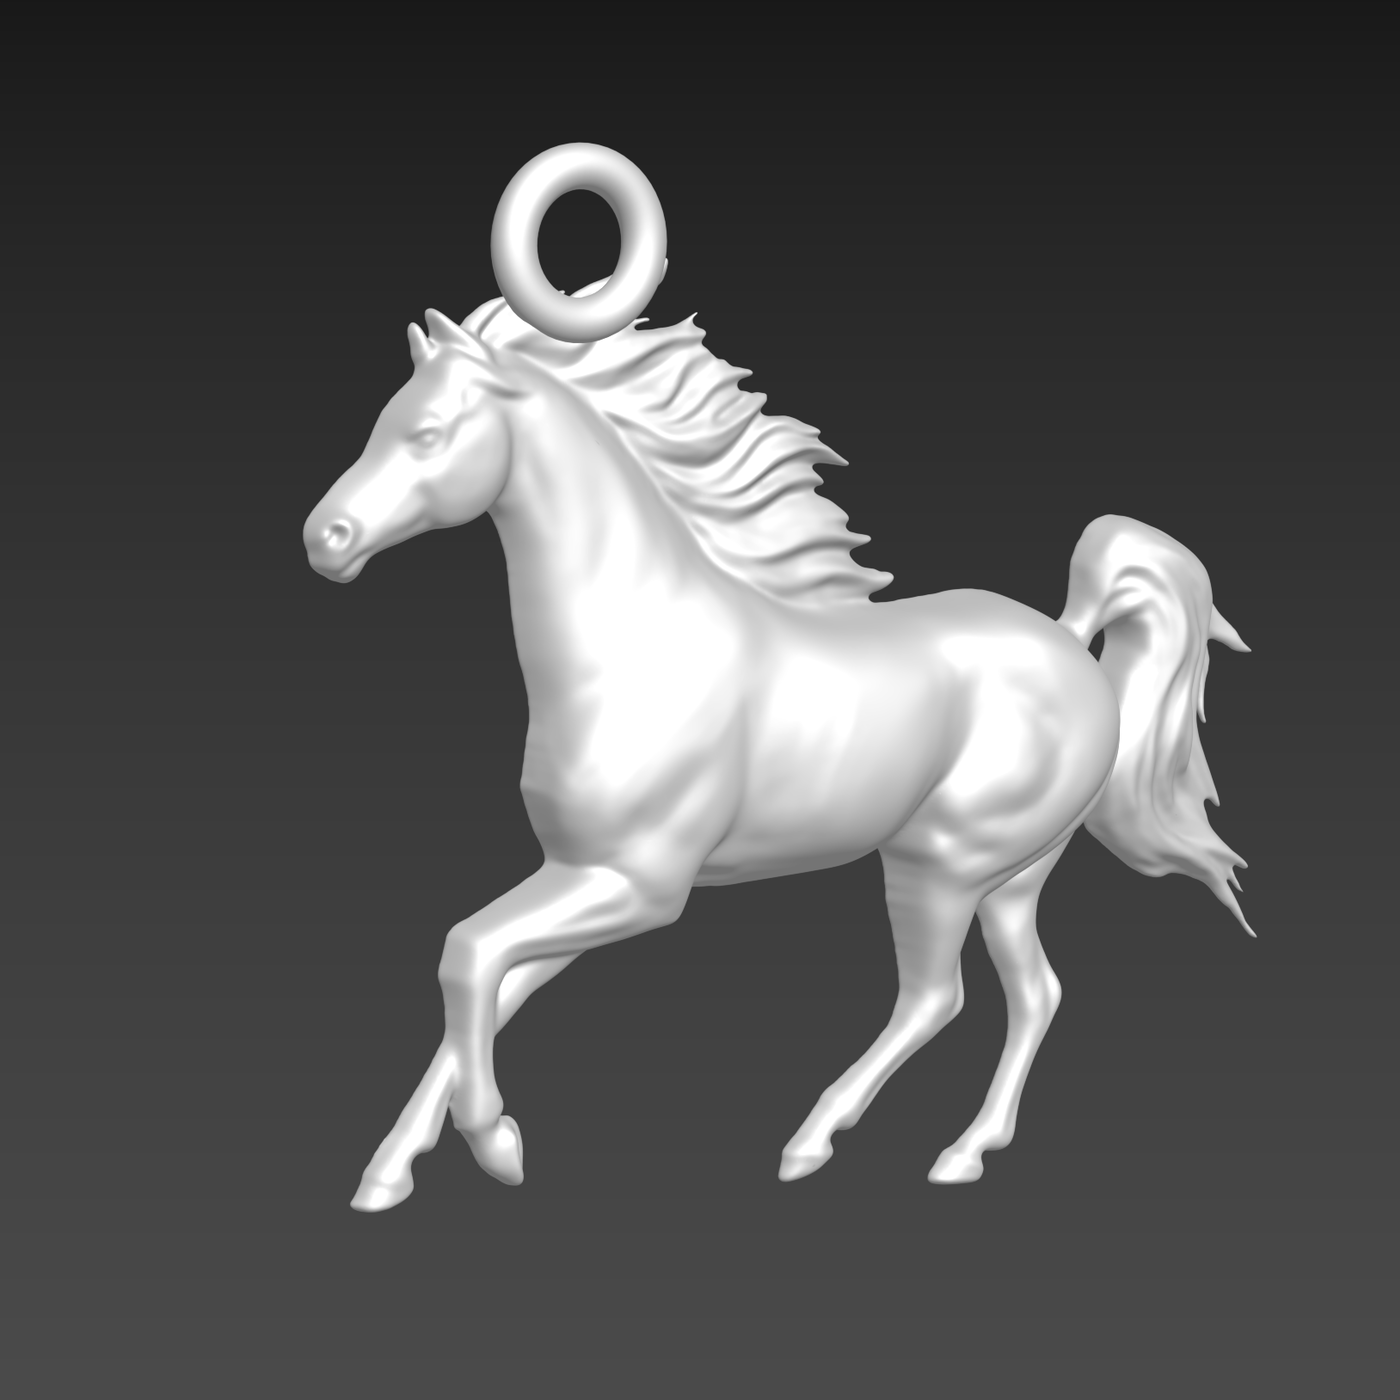 Horse Runner Sculpture pendant jewelry gold necklace medallion 3D print model